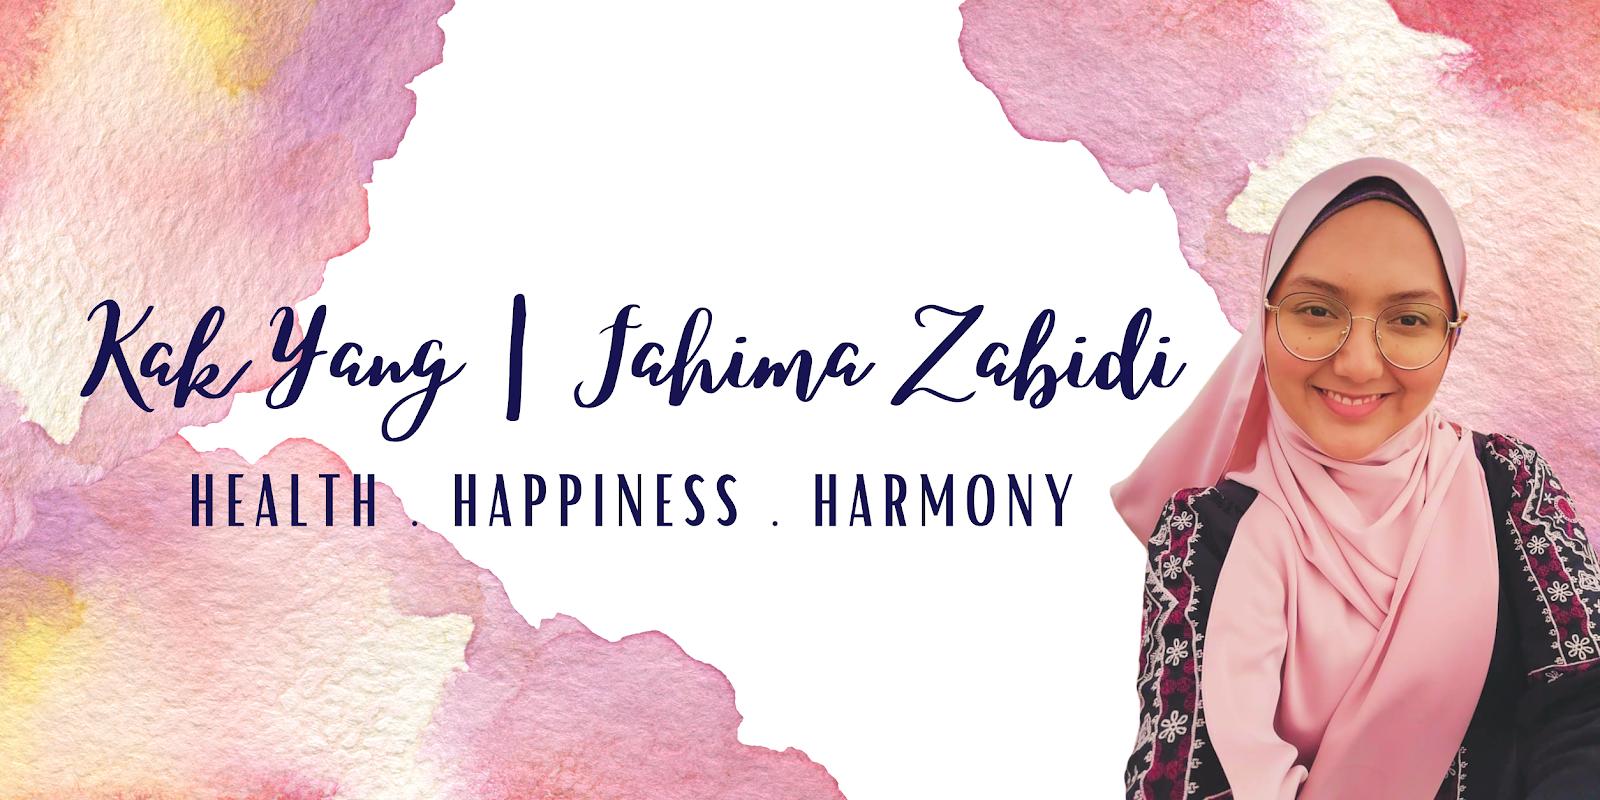 Fahima Zabidi | Kak Yang